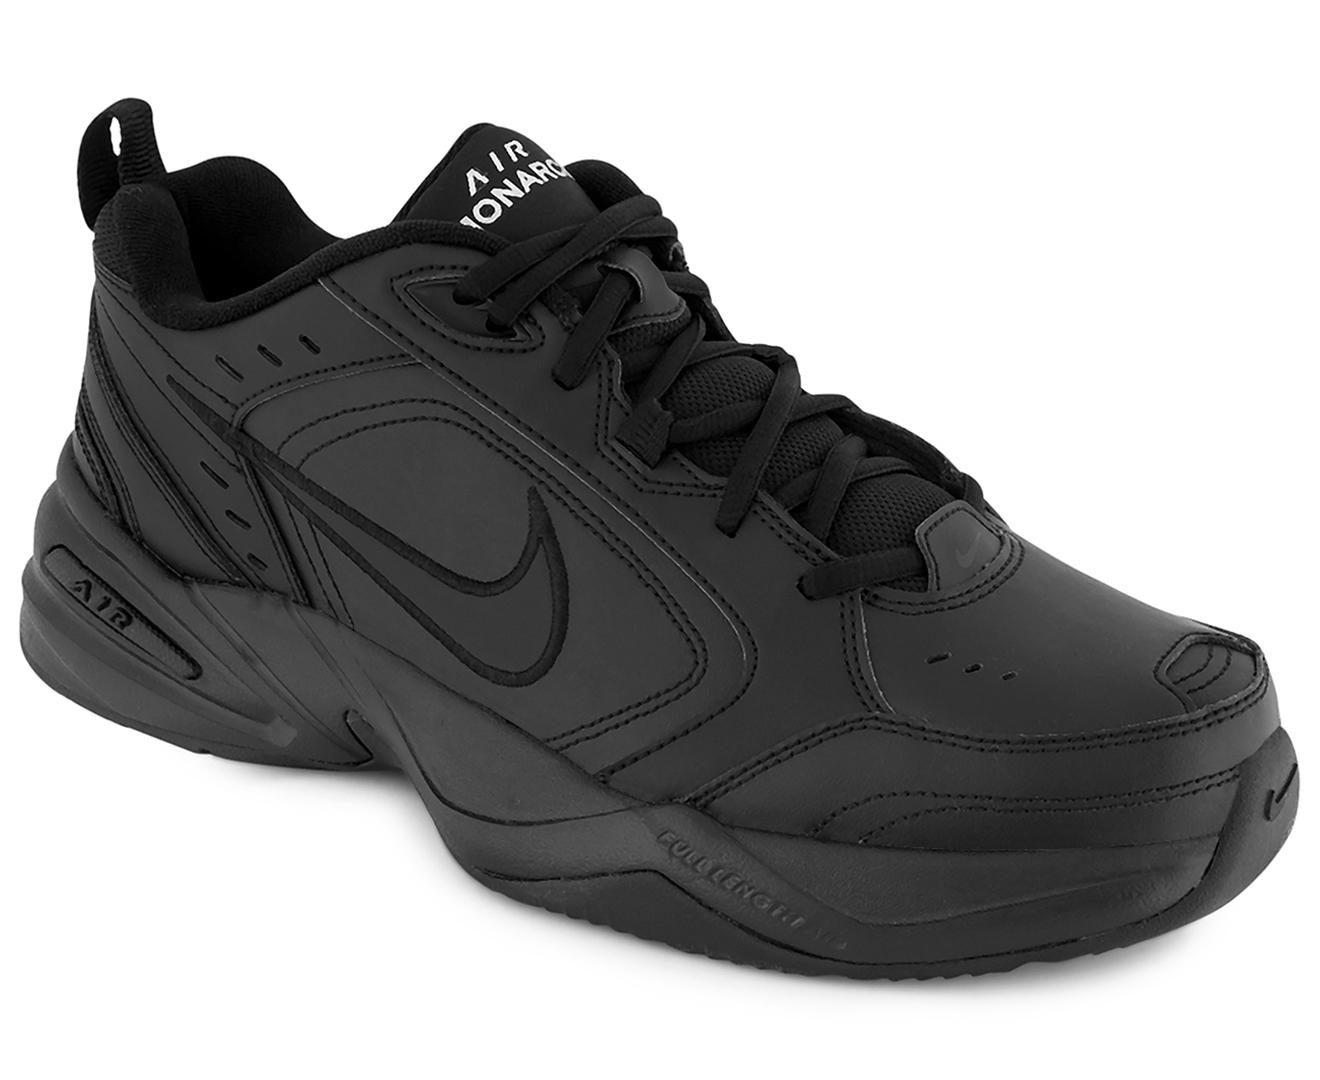 wholesale dealer 3faf9 7ff2f Nike-Men-039-s-Air-Monarch-IV-Shoe-